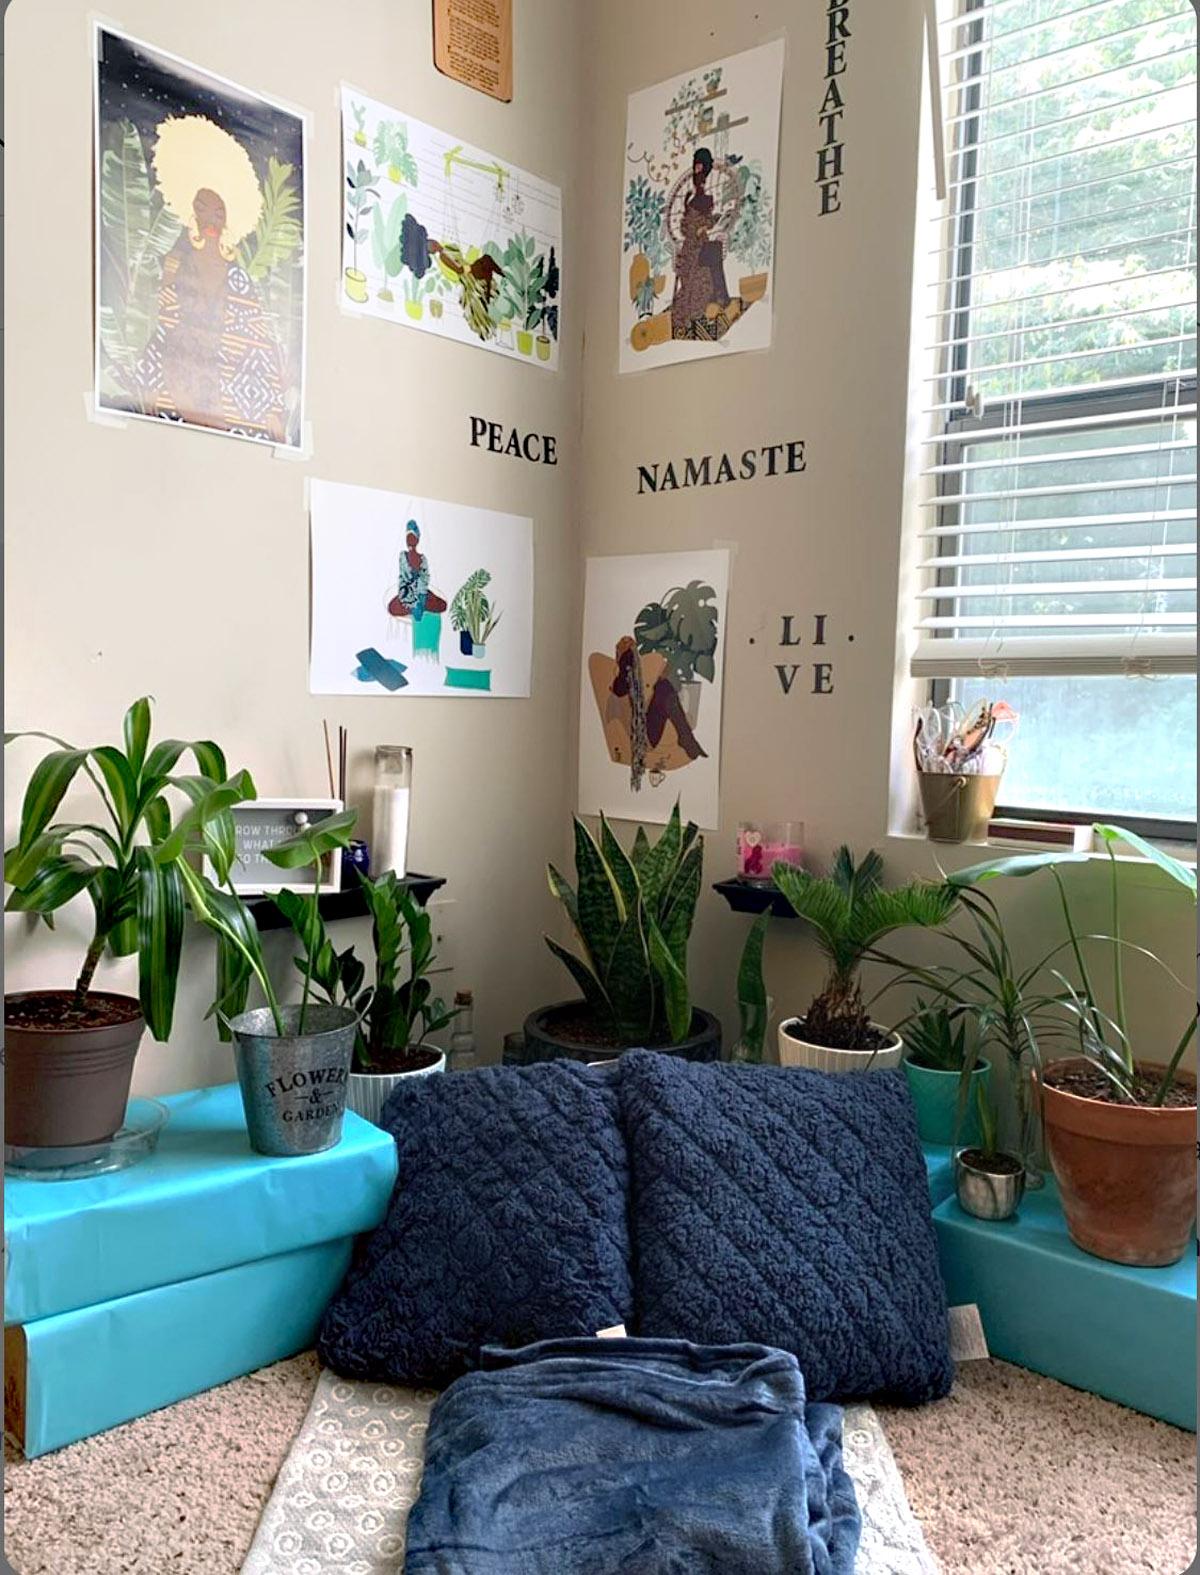 Plant Meditation Room by @quay_nicole on Instagram